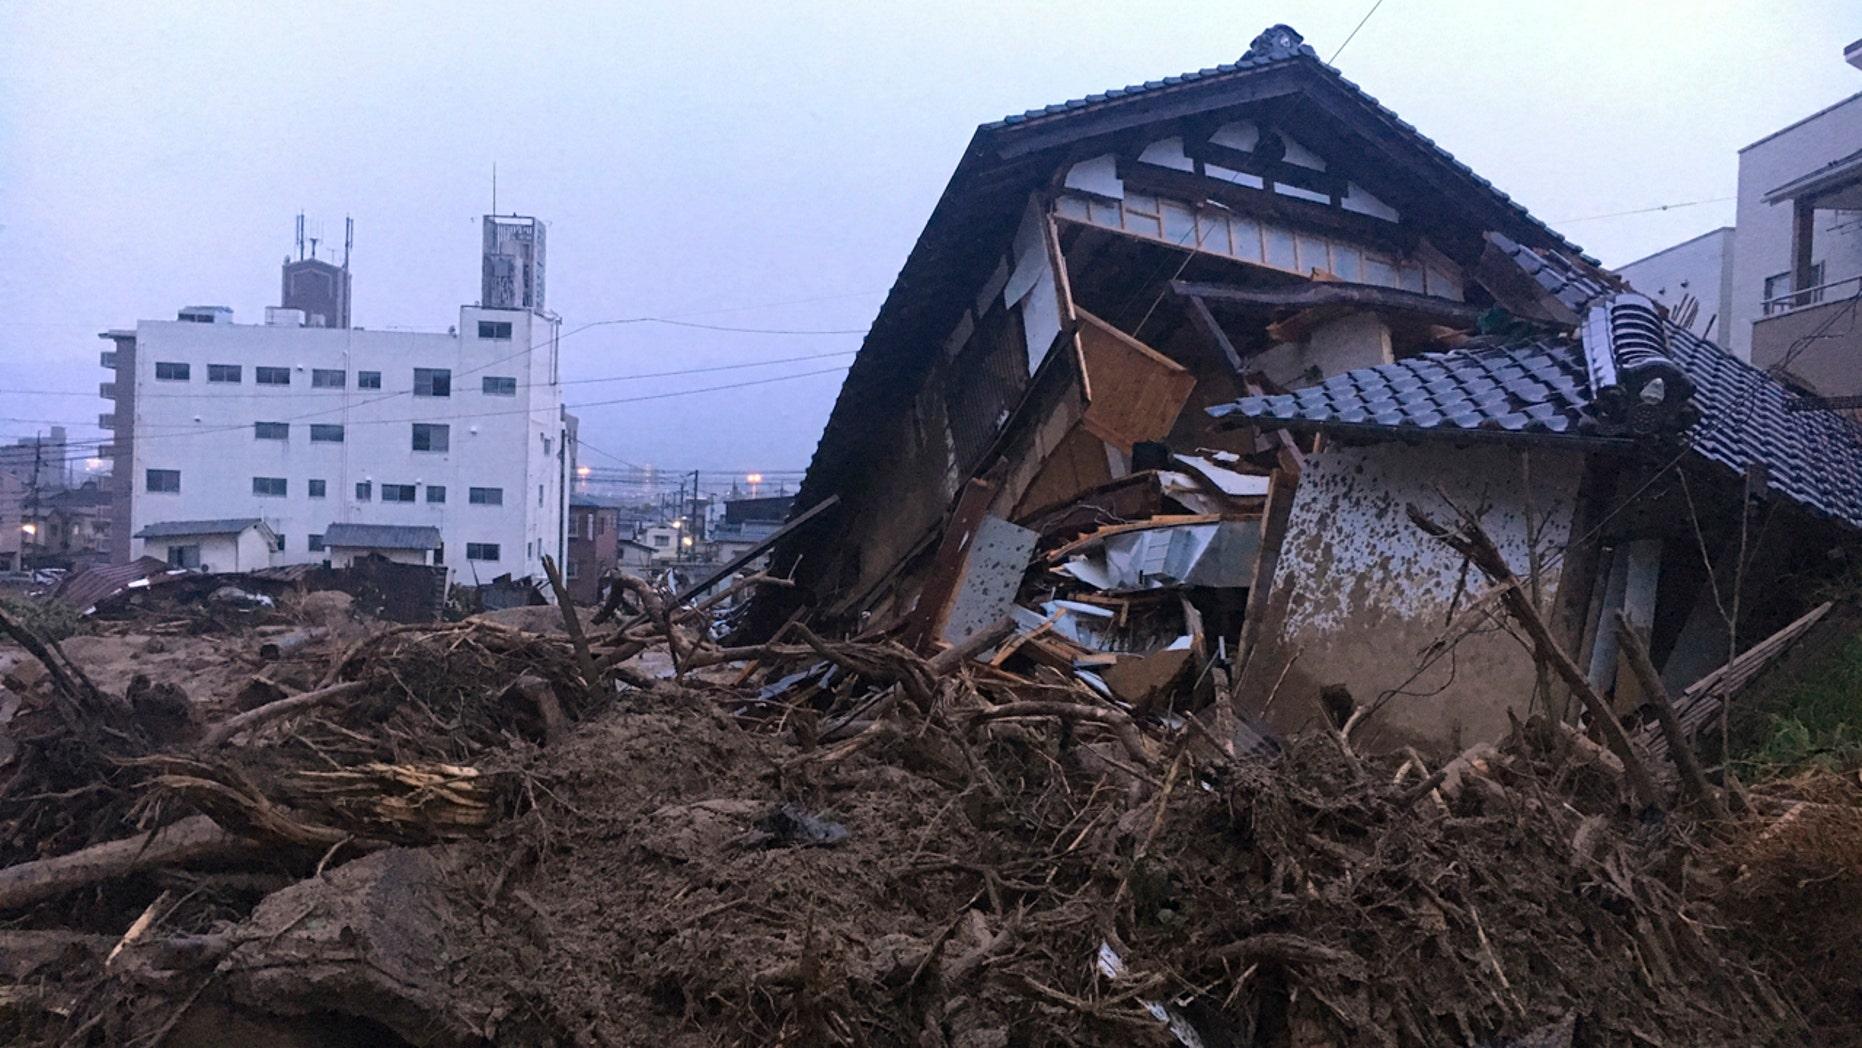 Debris fills a small village following heavy rains Sunday, July 8, 2018, in Kuchita-Minami, Asakita-ku, Hiroshima, Japan. Searches continued Sunday night for dozens of victims still missing from the heavy rainfall that hammered southern Japan for the third straight day. (AP Photo Haruka Nuga)